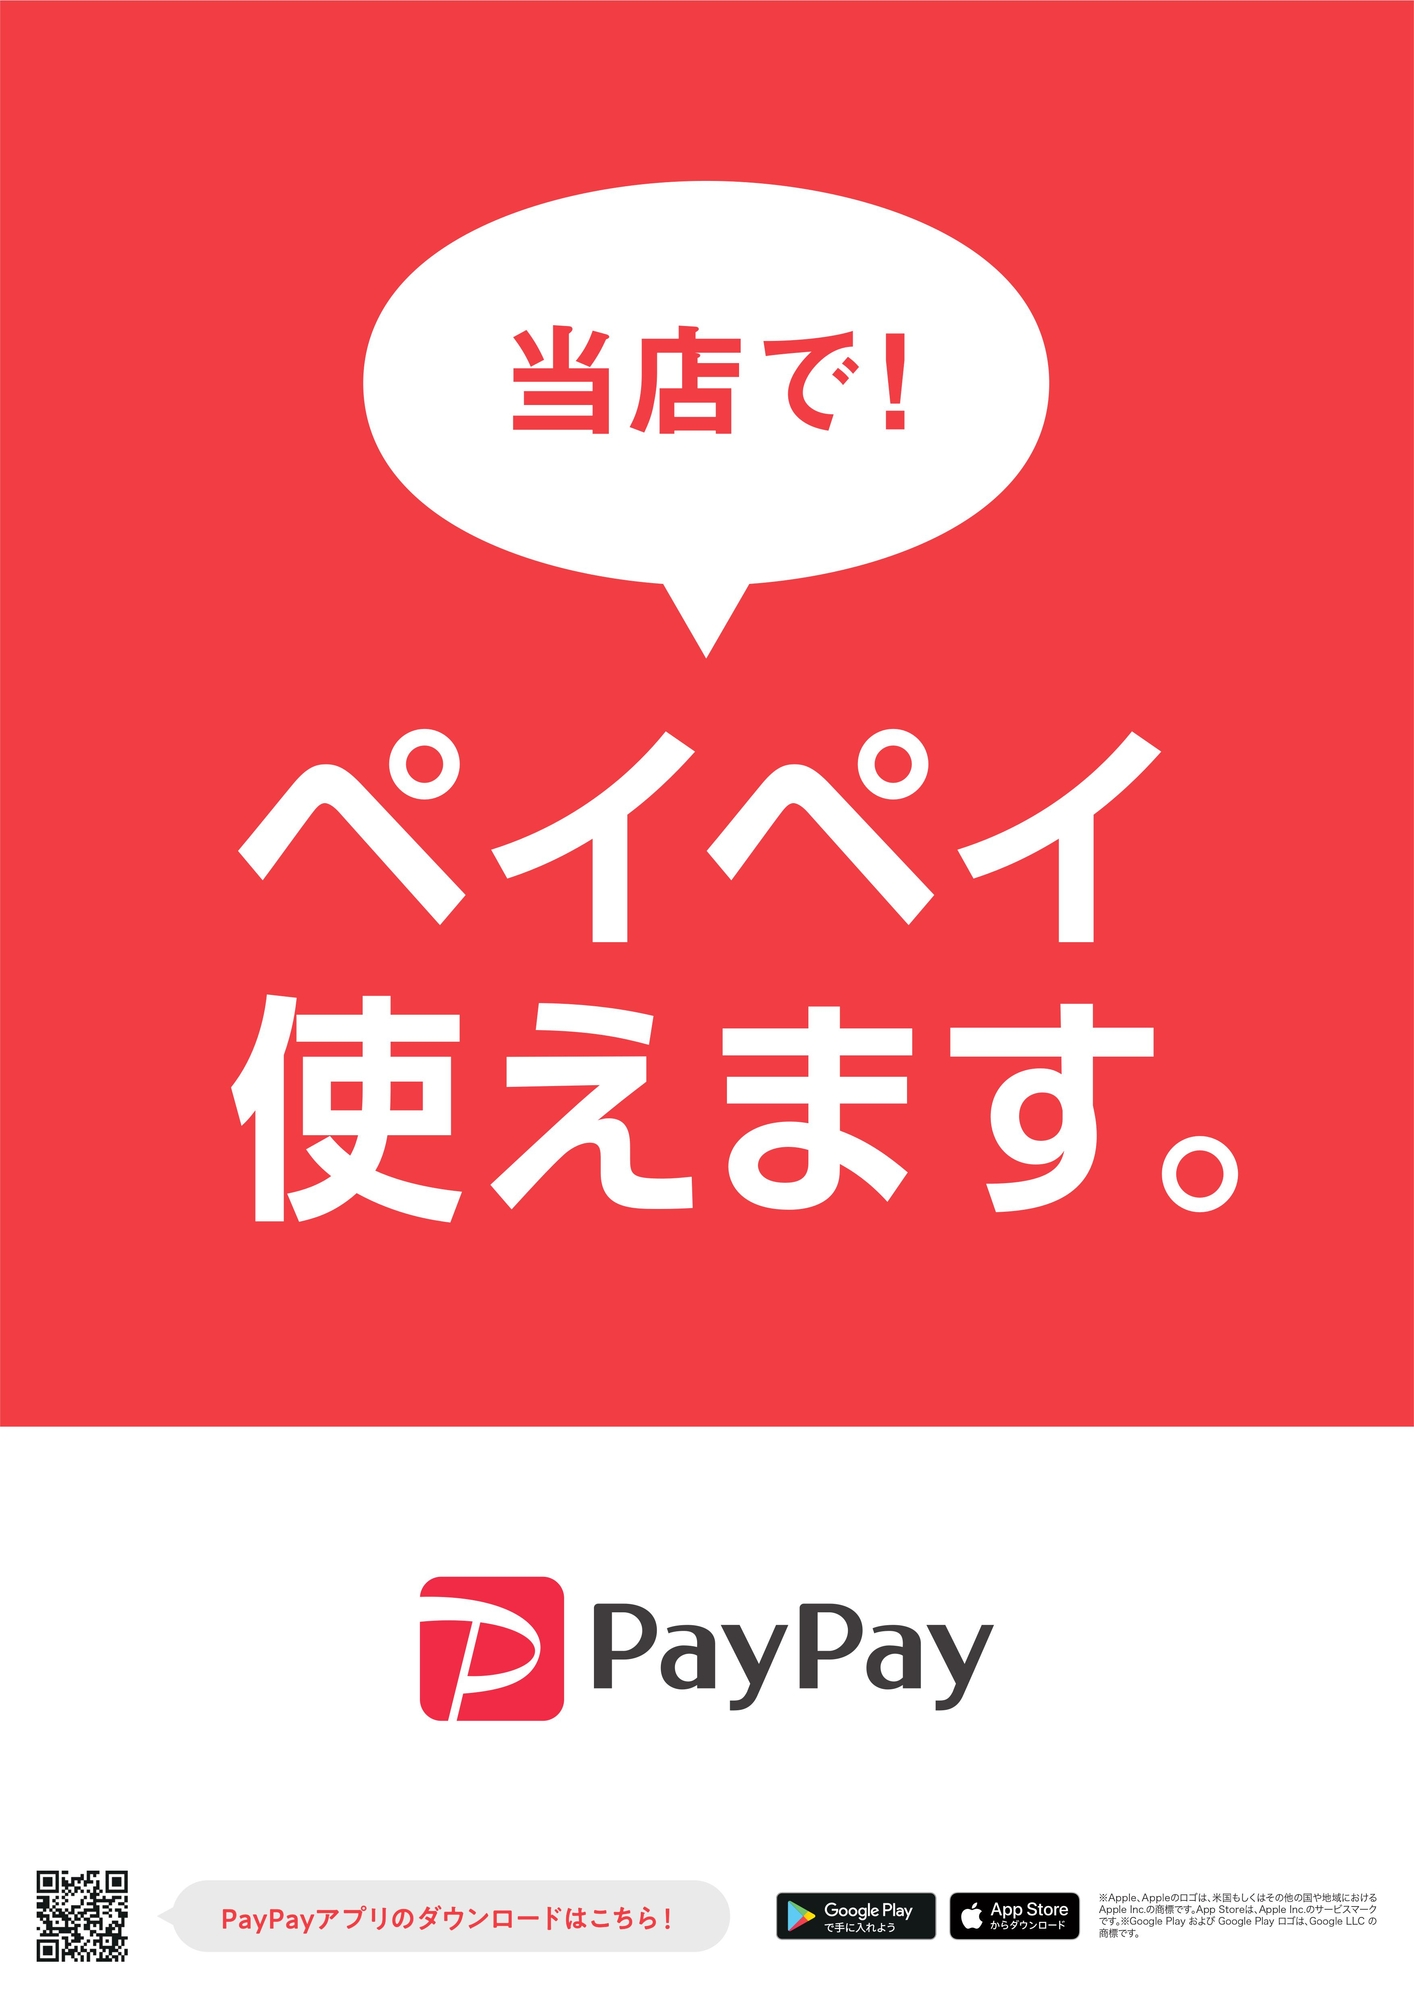 PayPayでお支払いができます